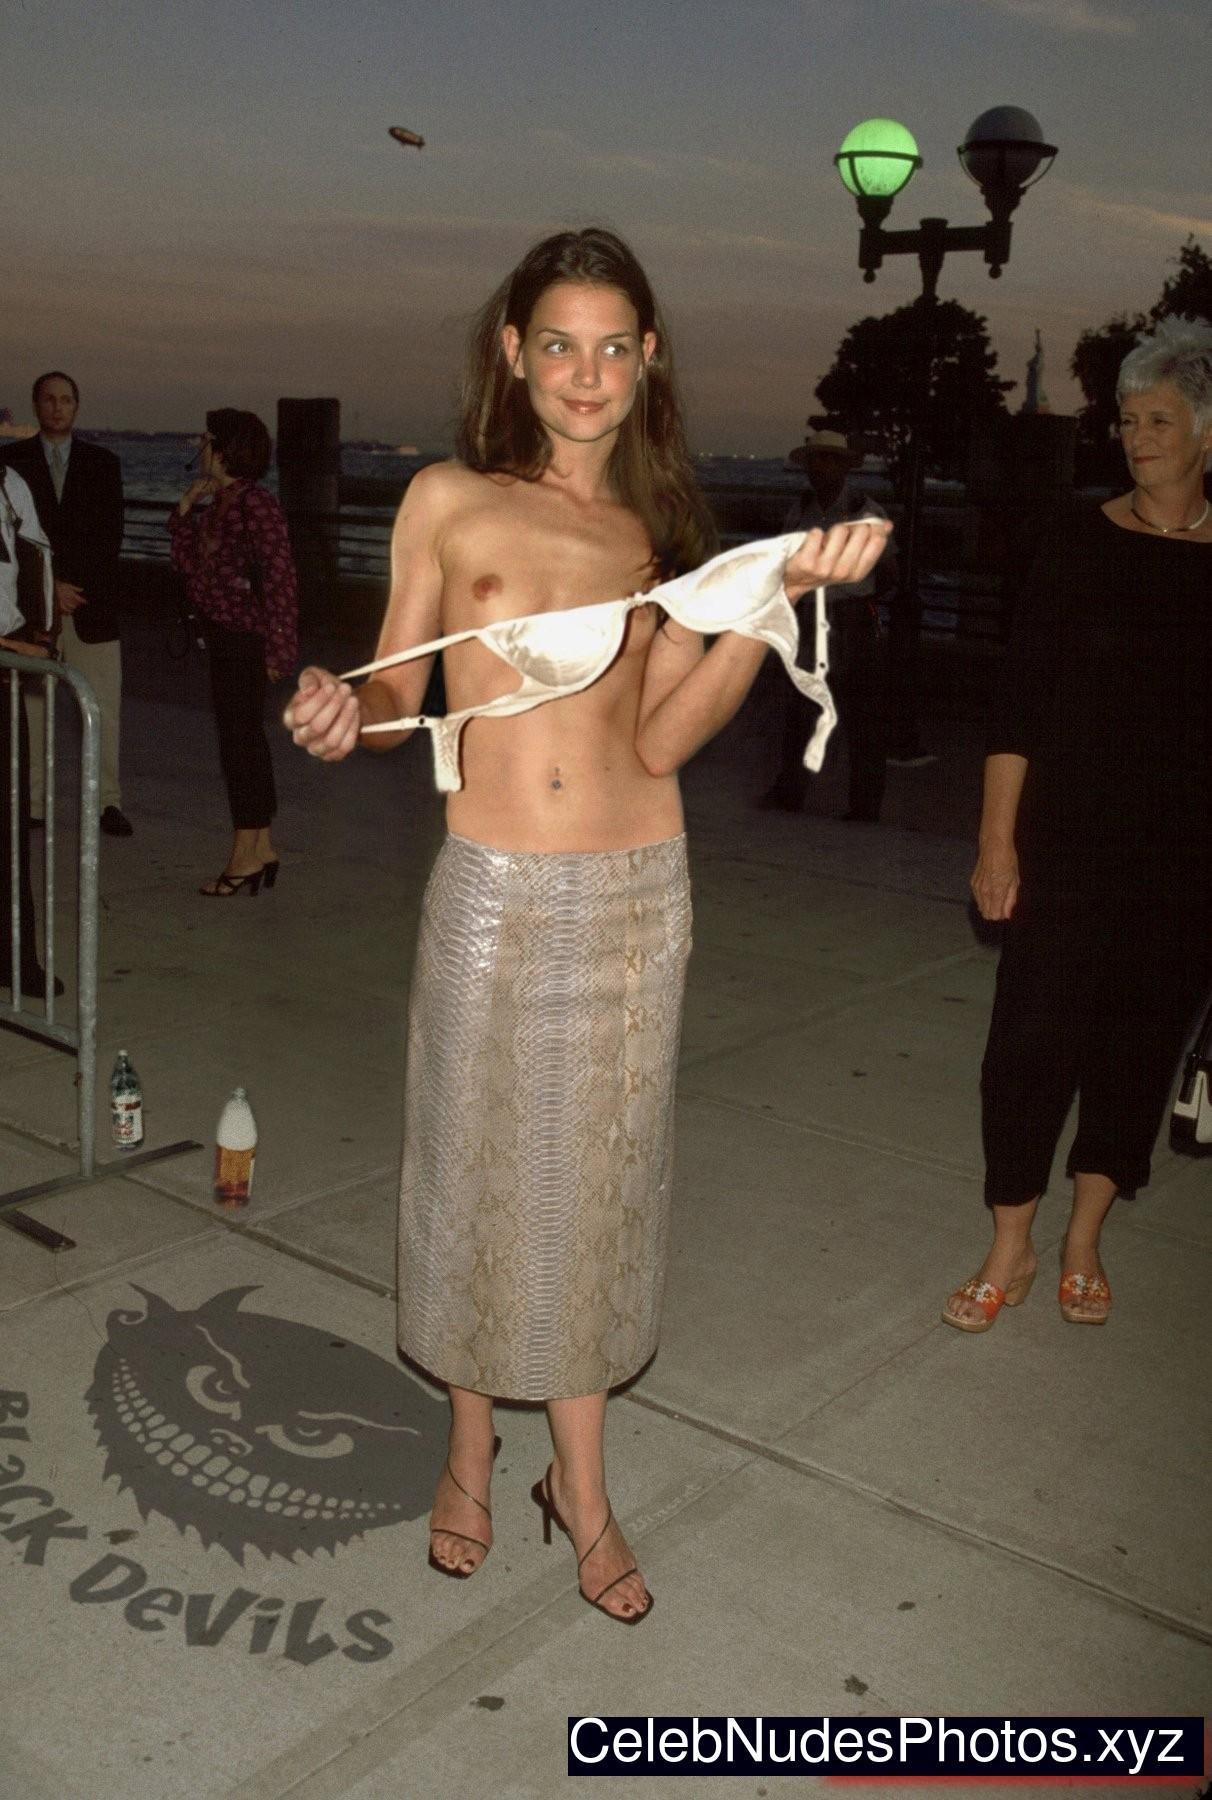 Mimi macphearson sex tape